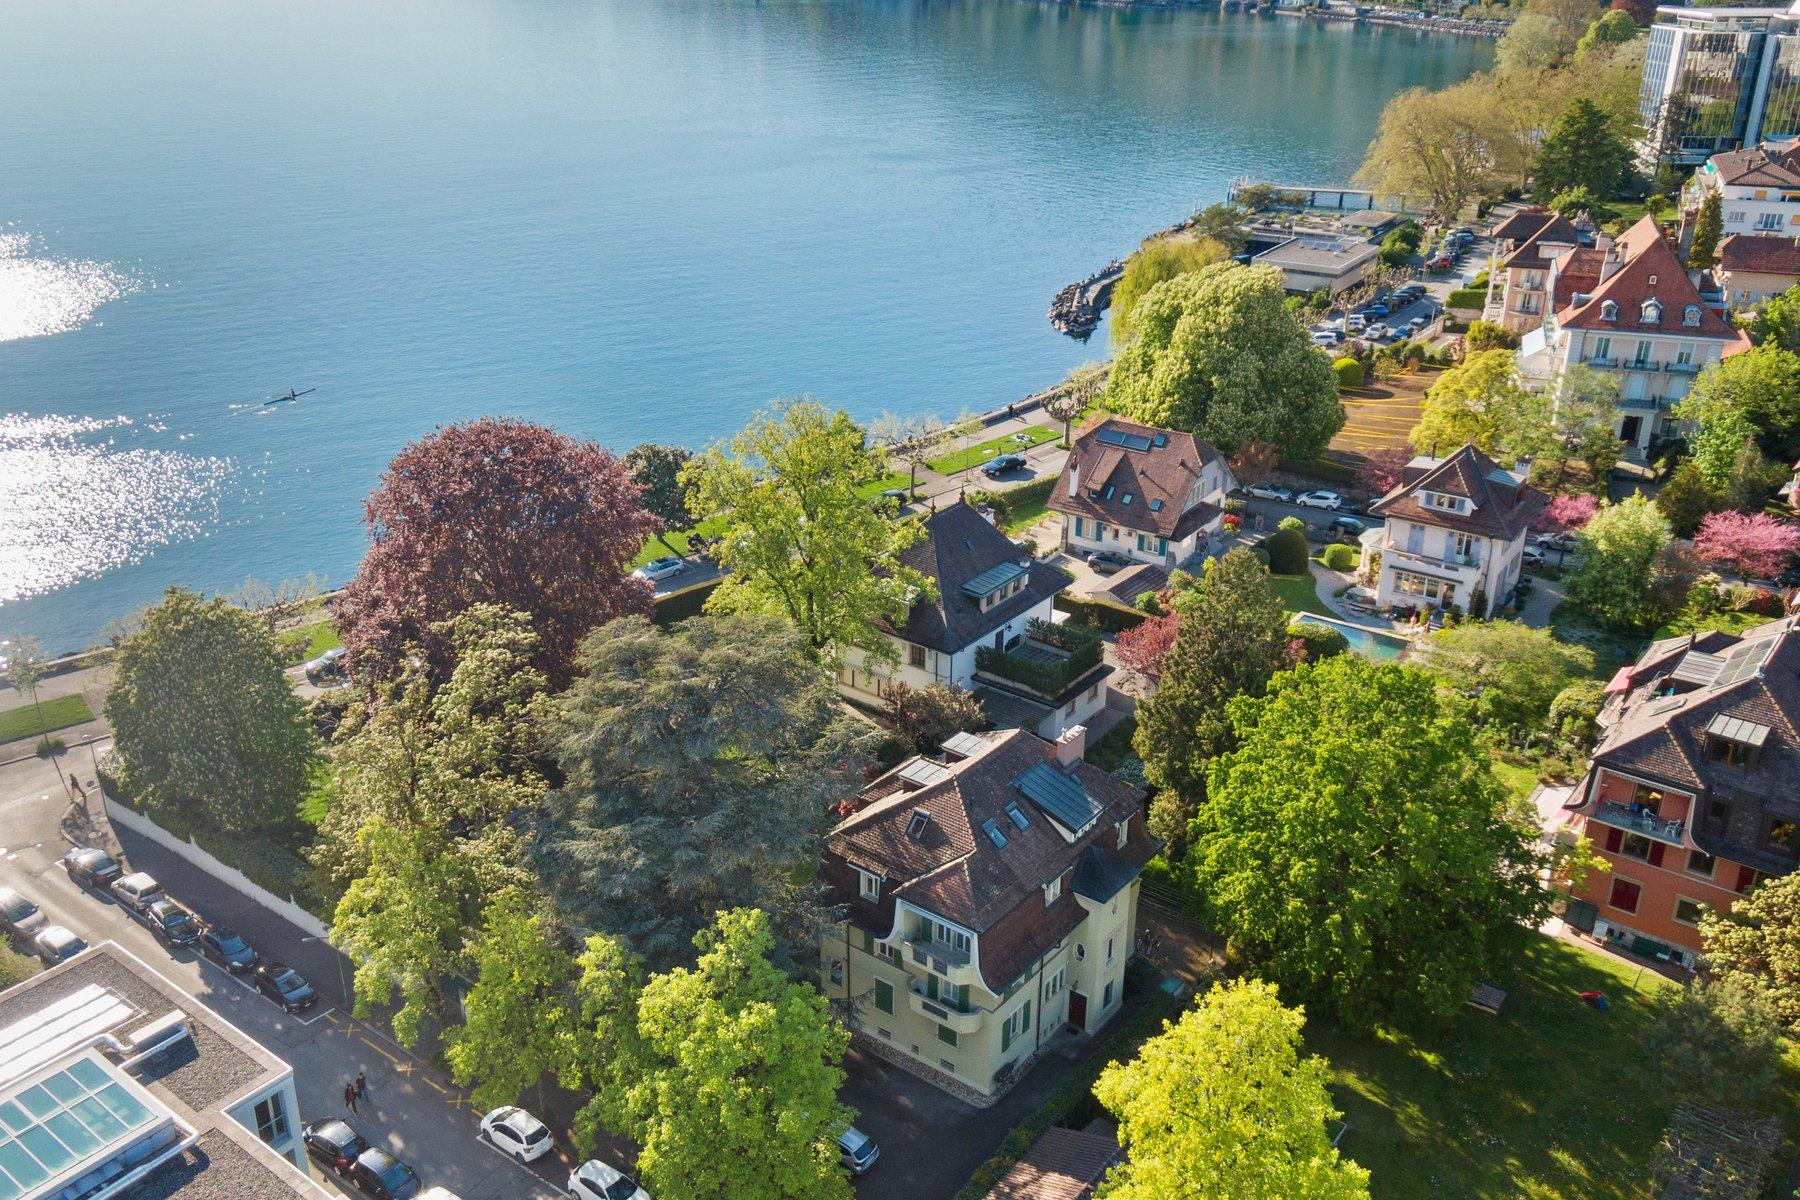 Condo in Vevey, Vaud, Switzerland 1 - 11438500